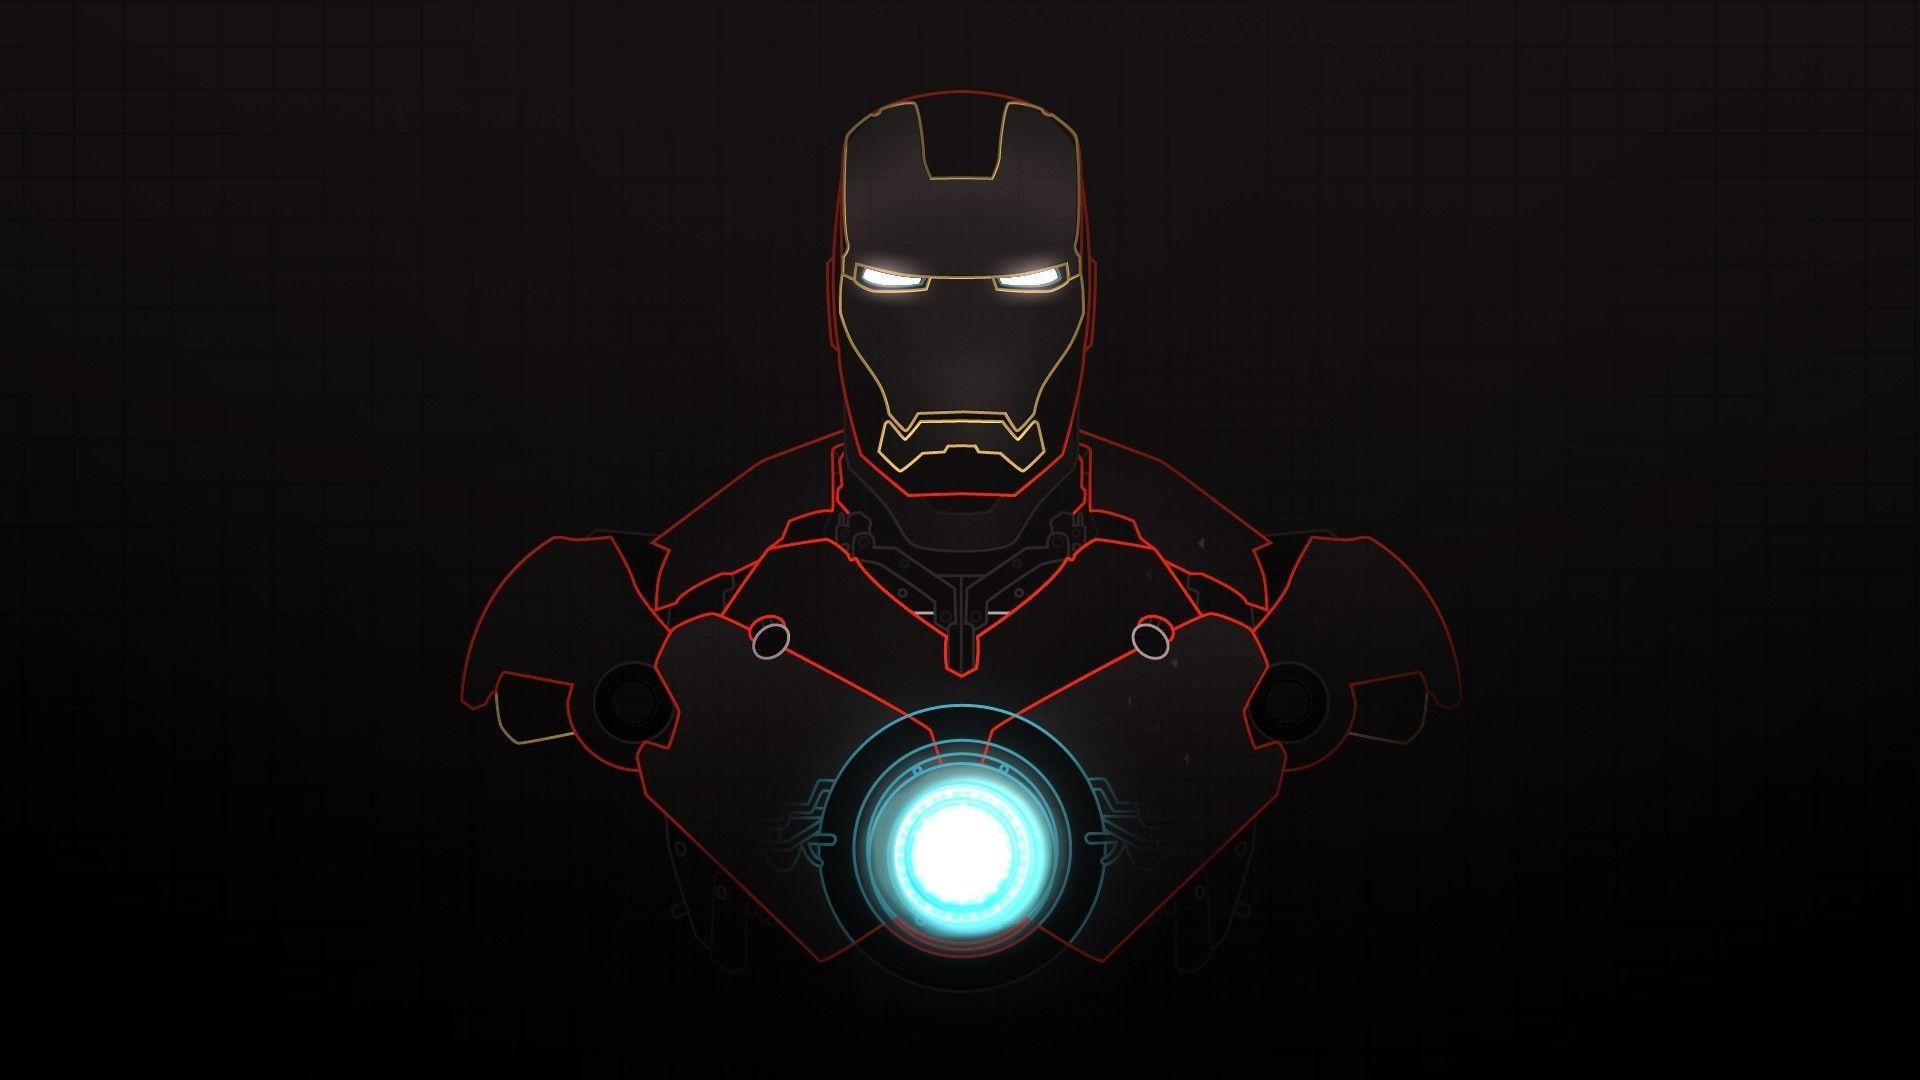 X Hd Neon Wallpapers Iron Man Wallpaper Iron Man Hd Wallpaper Man Wallpaper